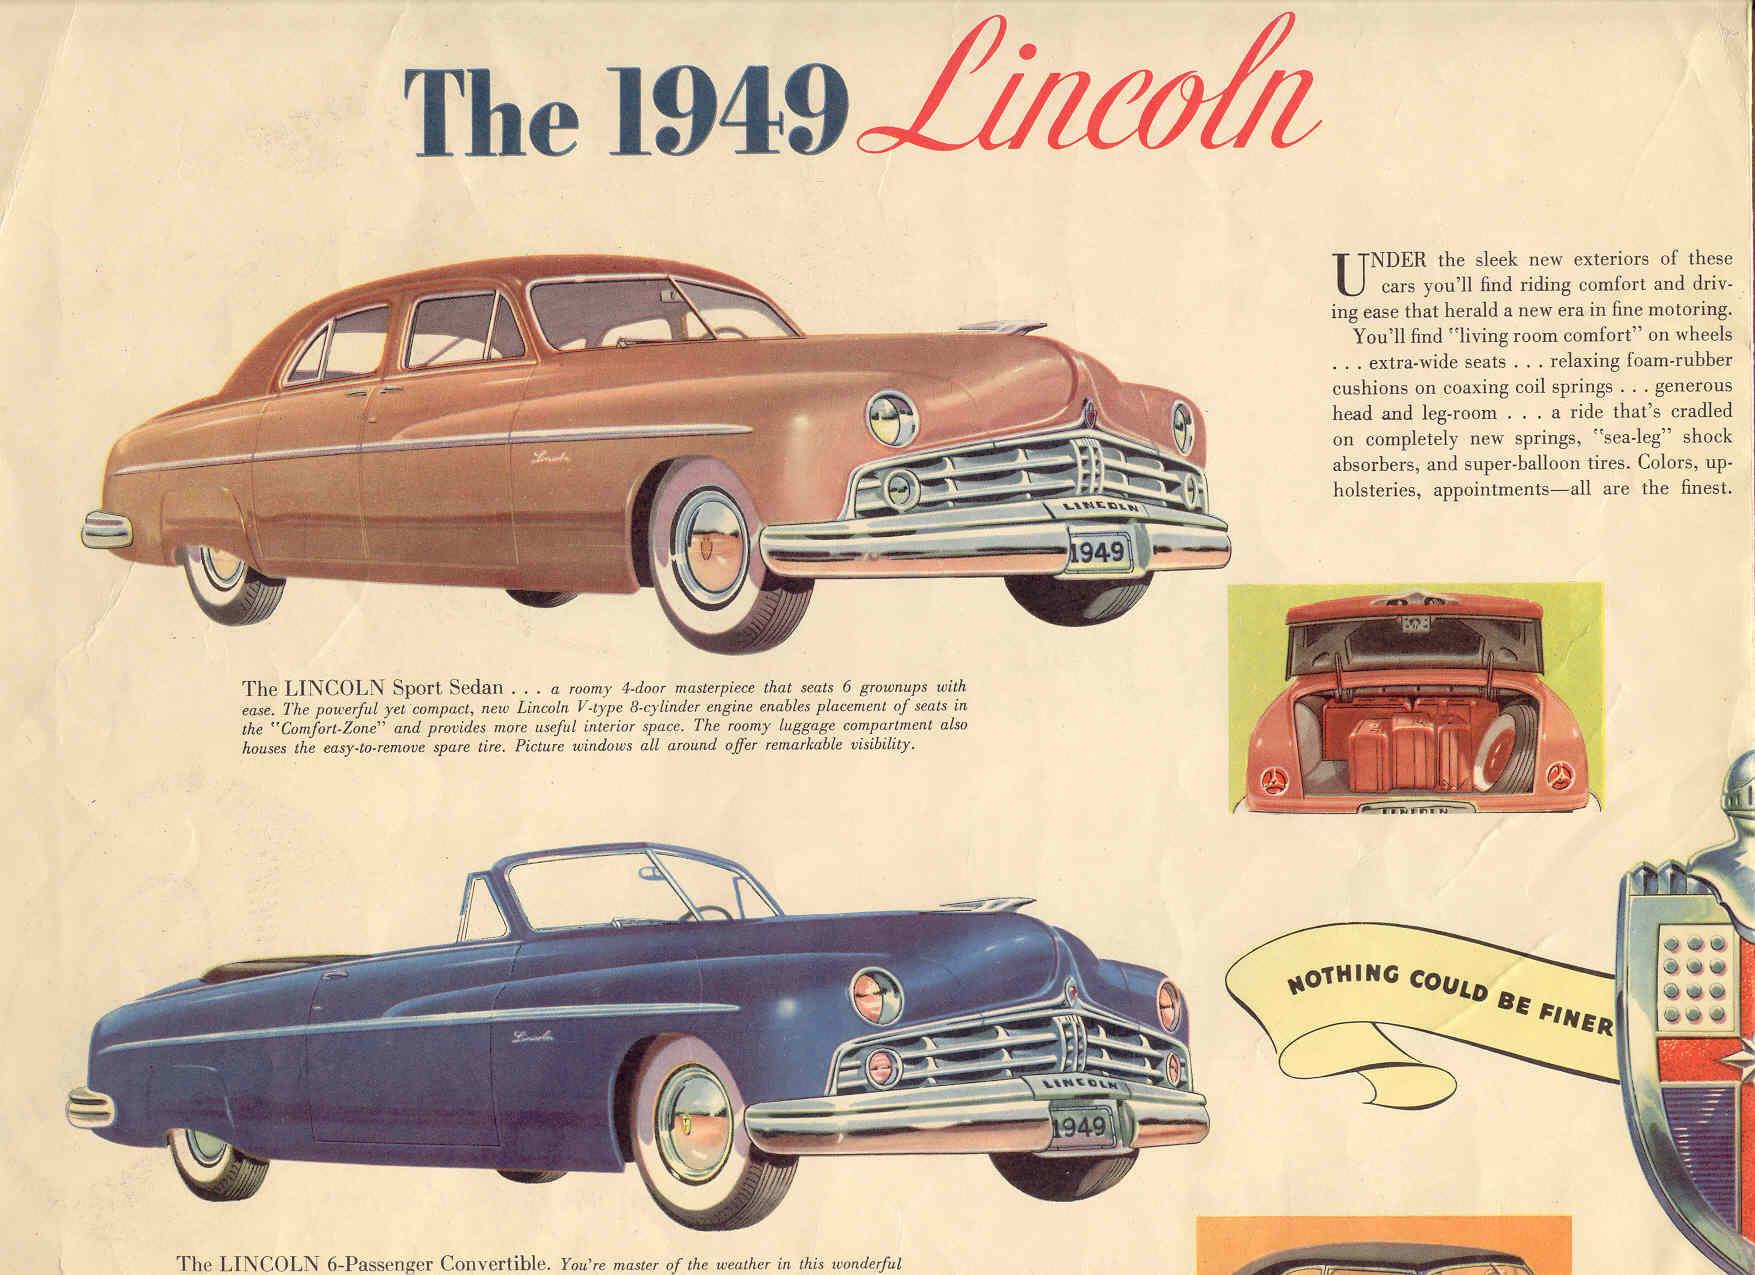 /1949 Lincoln (2).jpg